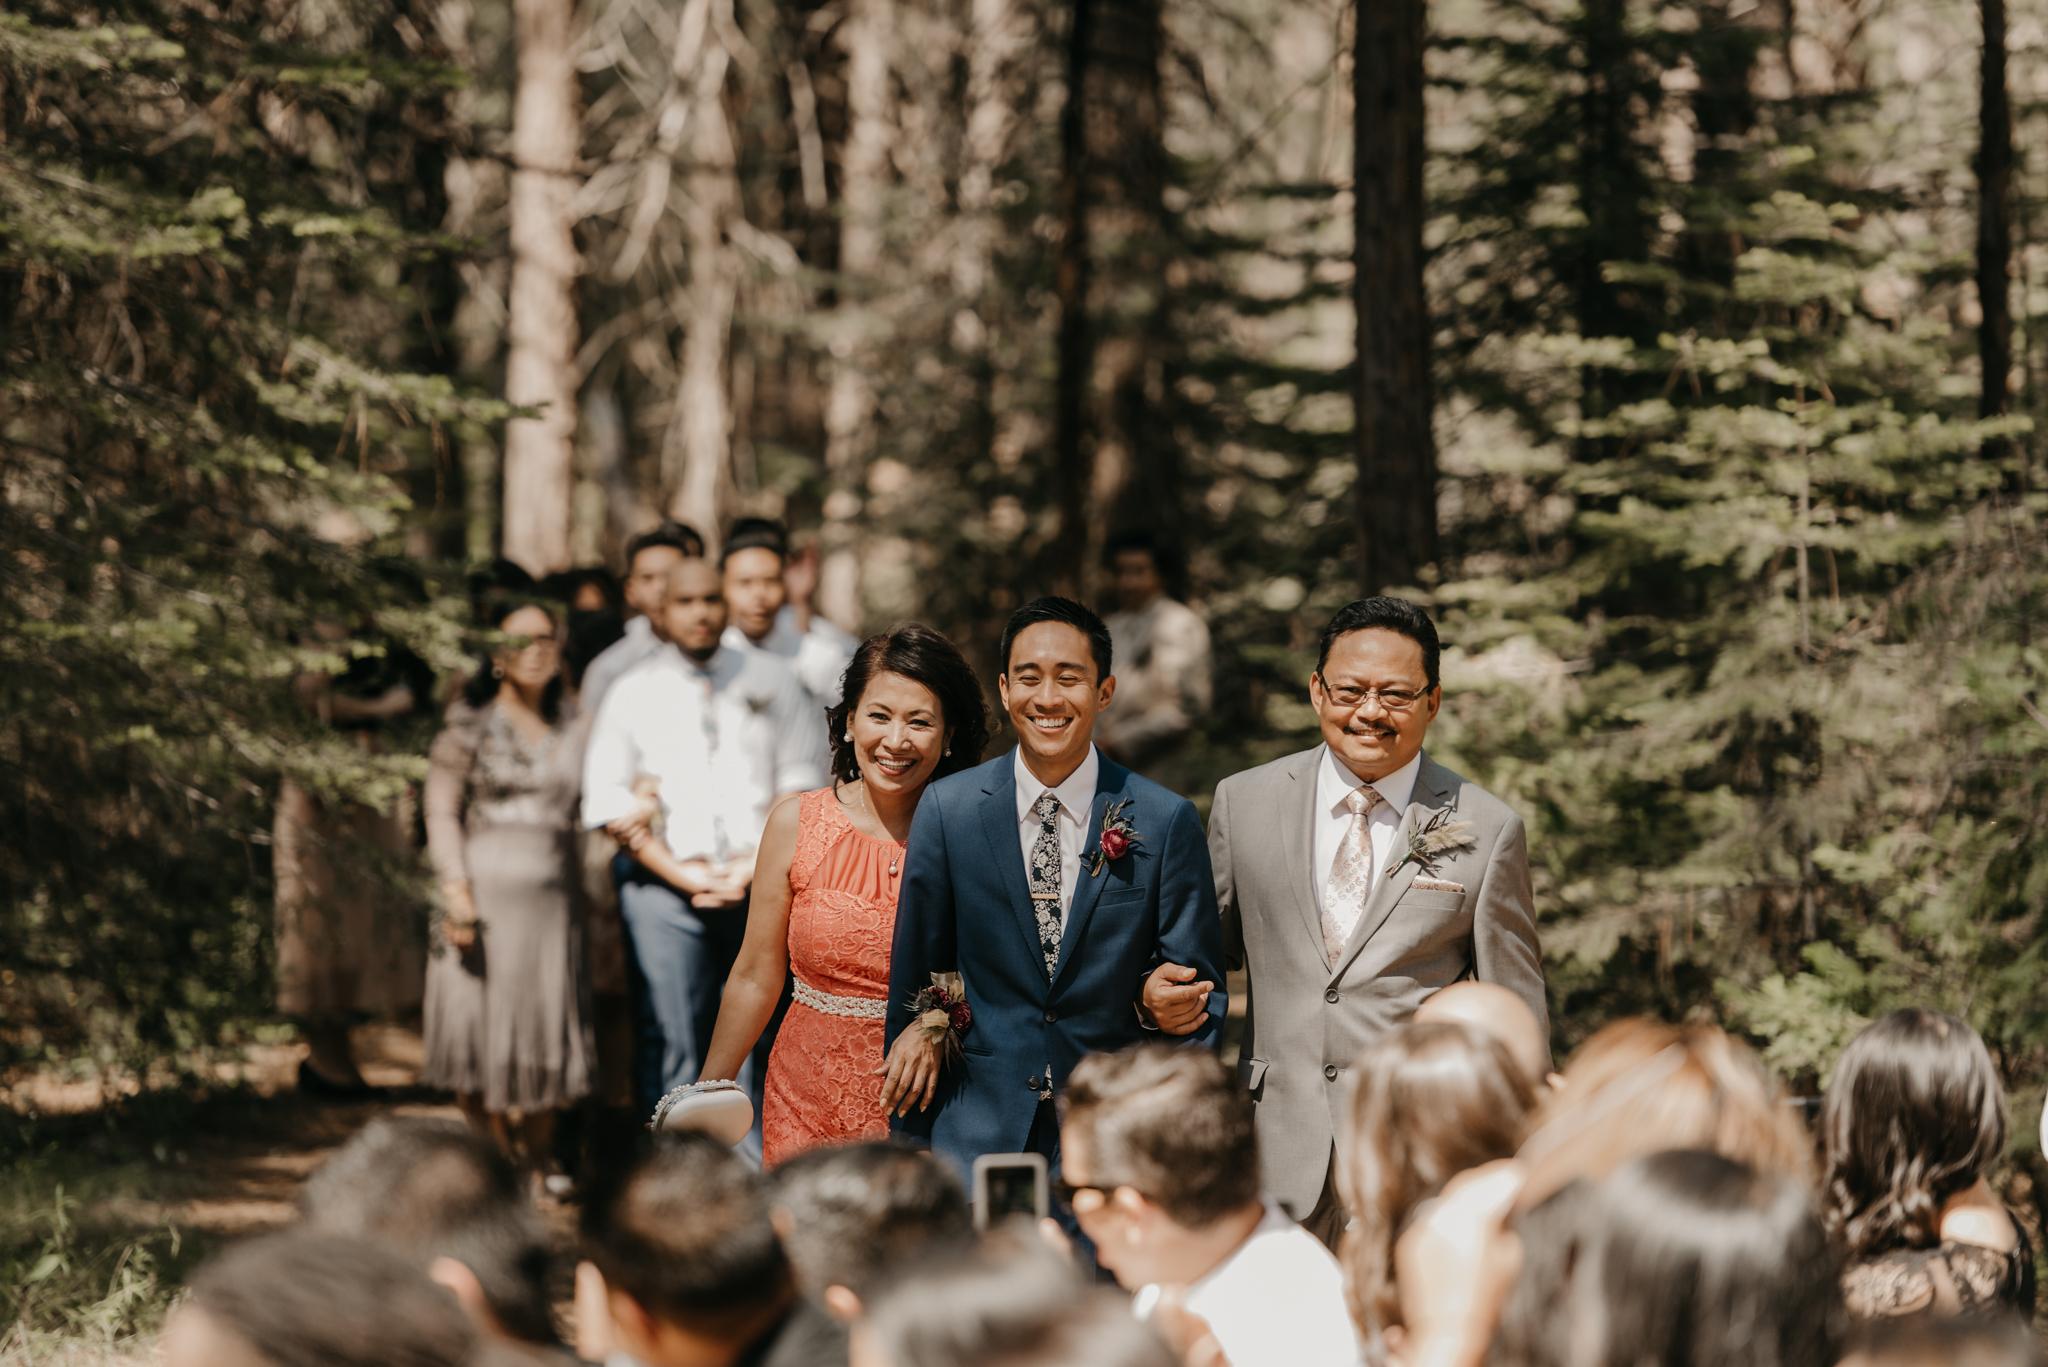 © Isaiah + Taylor Photography - Evergreen Lodge Destination Yoesmite Wedding - Los Angeles Wedding Photographer-104.jpg